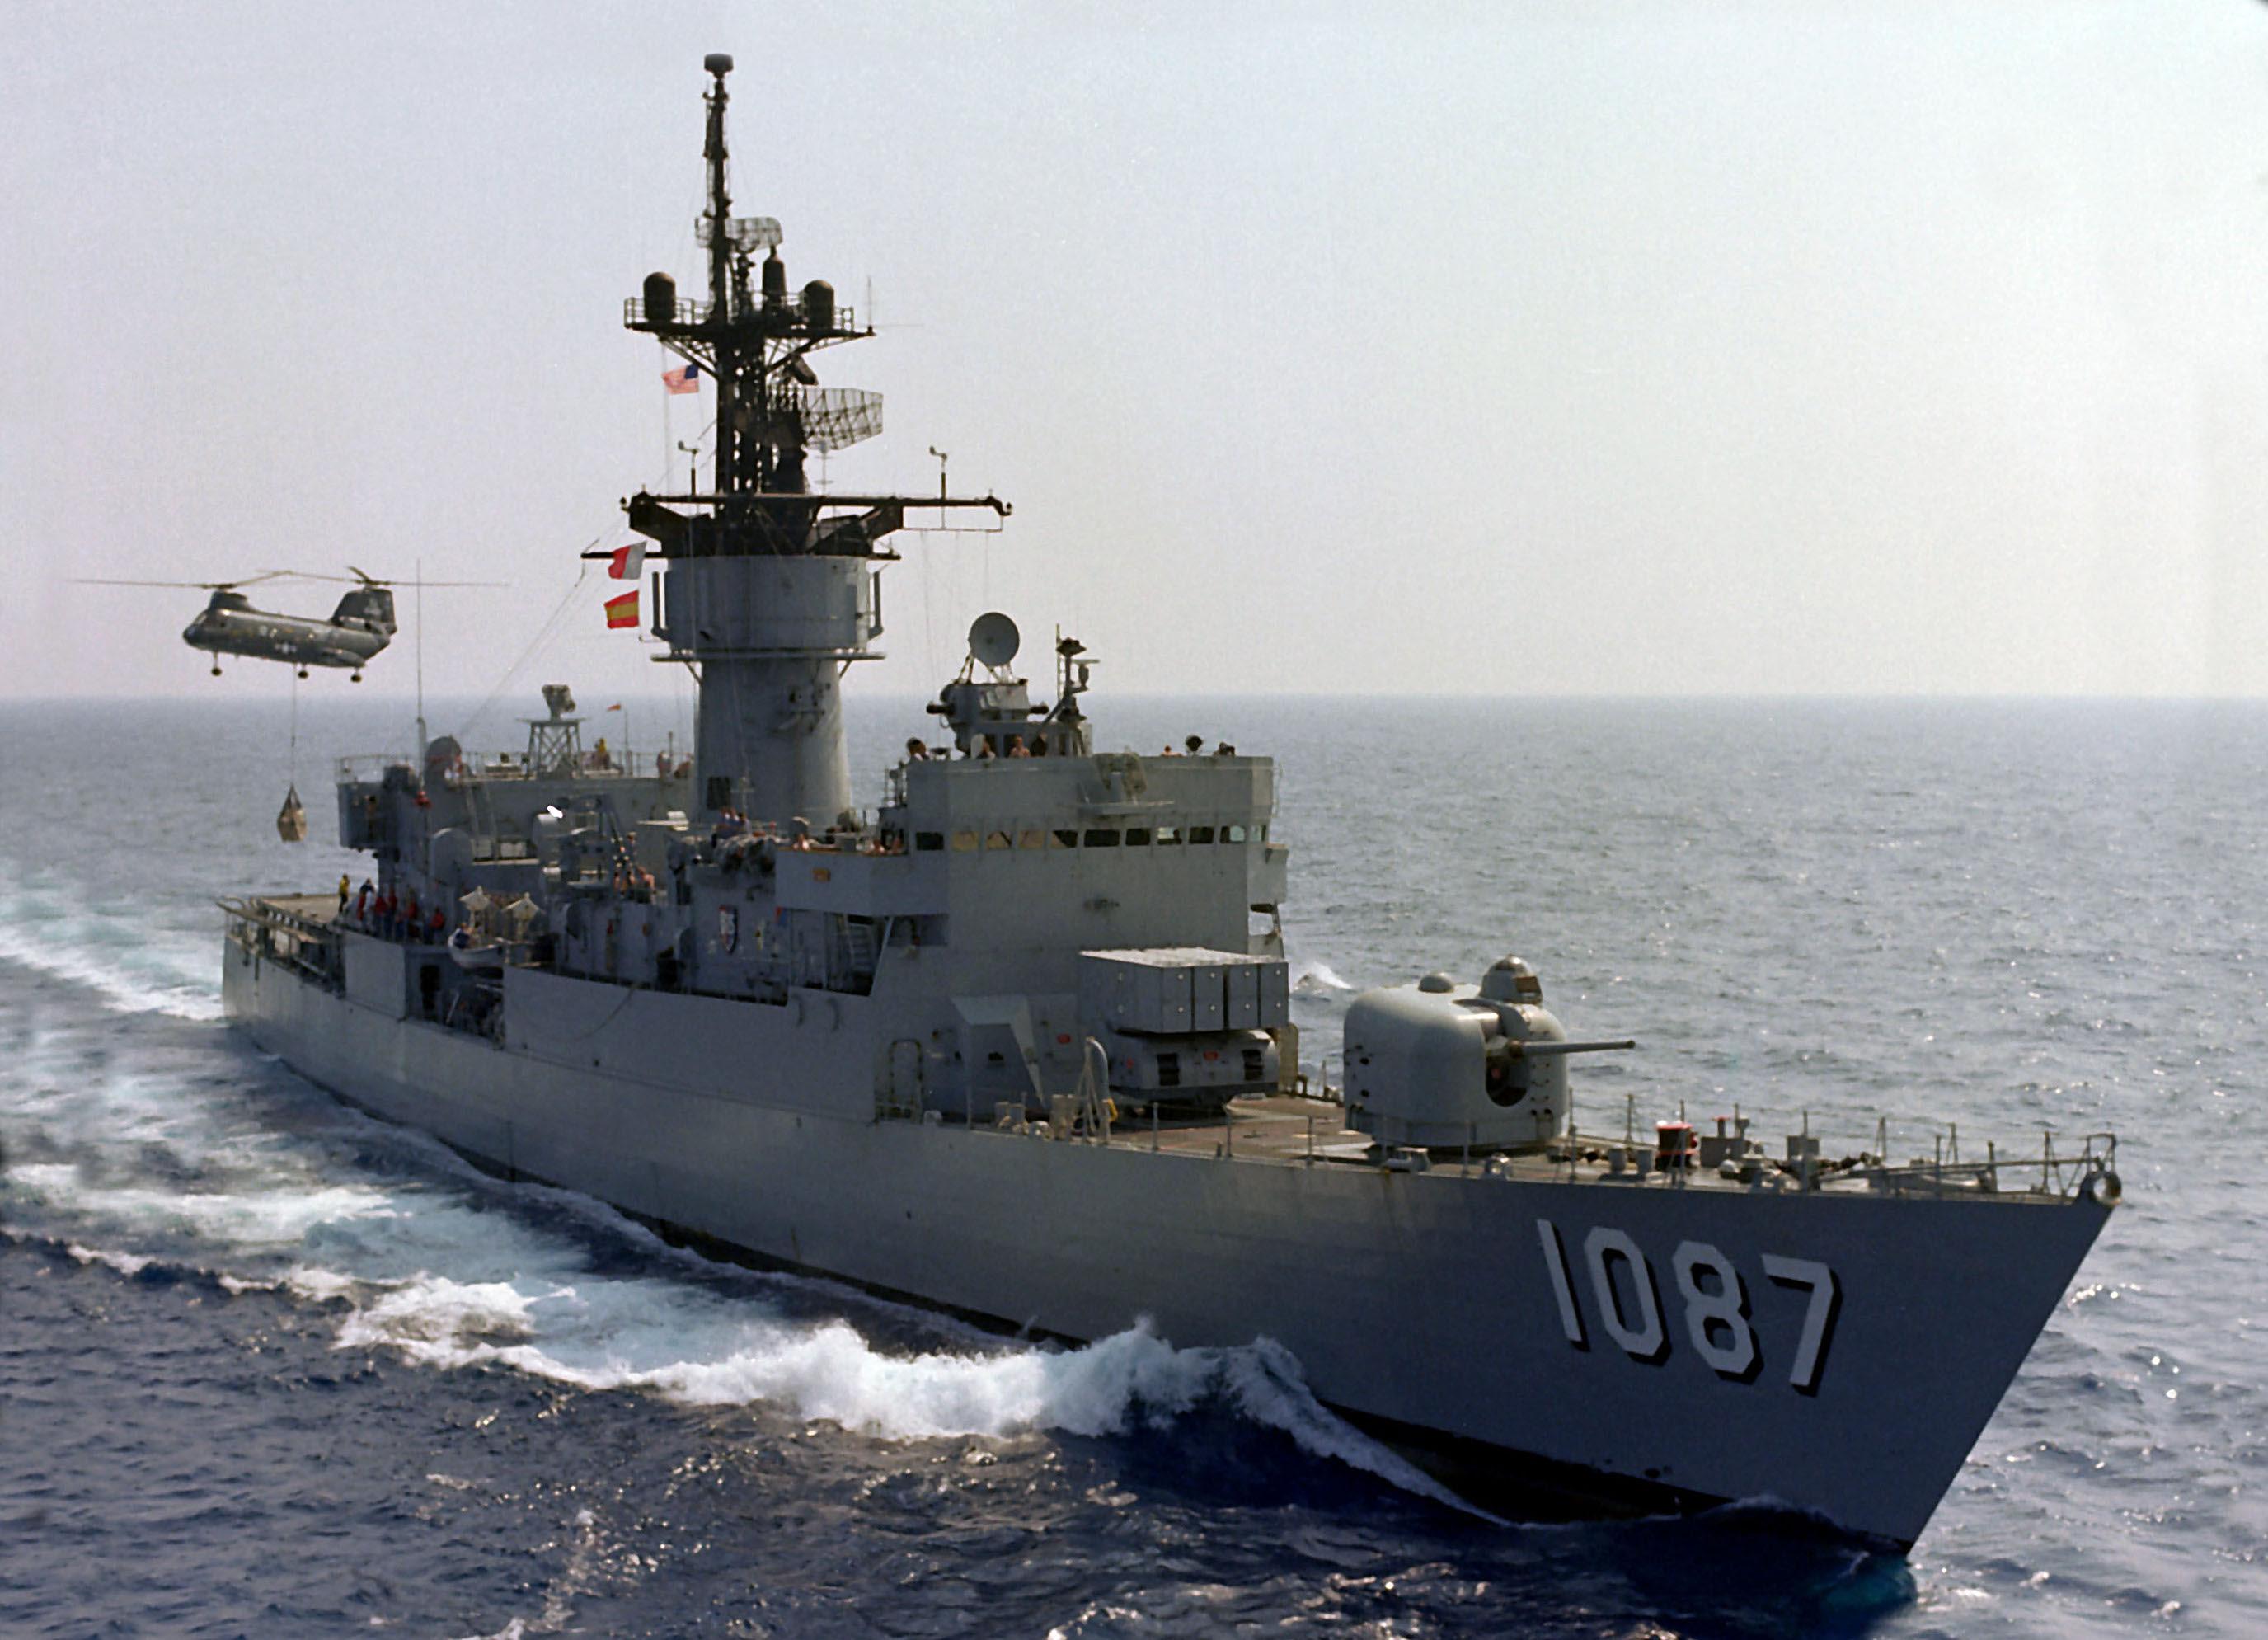 http://upload.wikimedia.org/wikipedia/commons/1/1e/USS_Kirk_%28FF-1087%29_UNREP.jpg